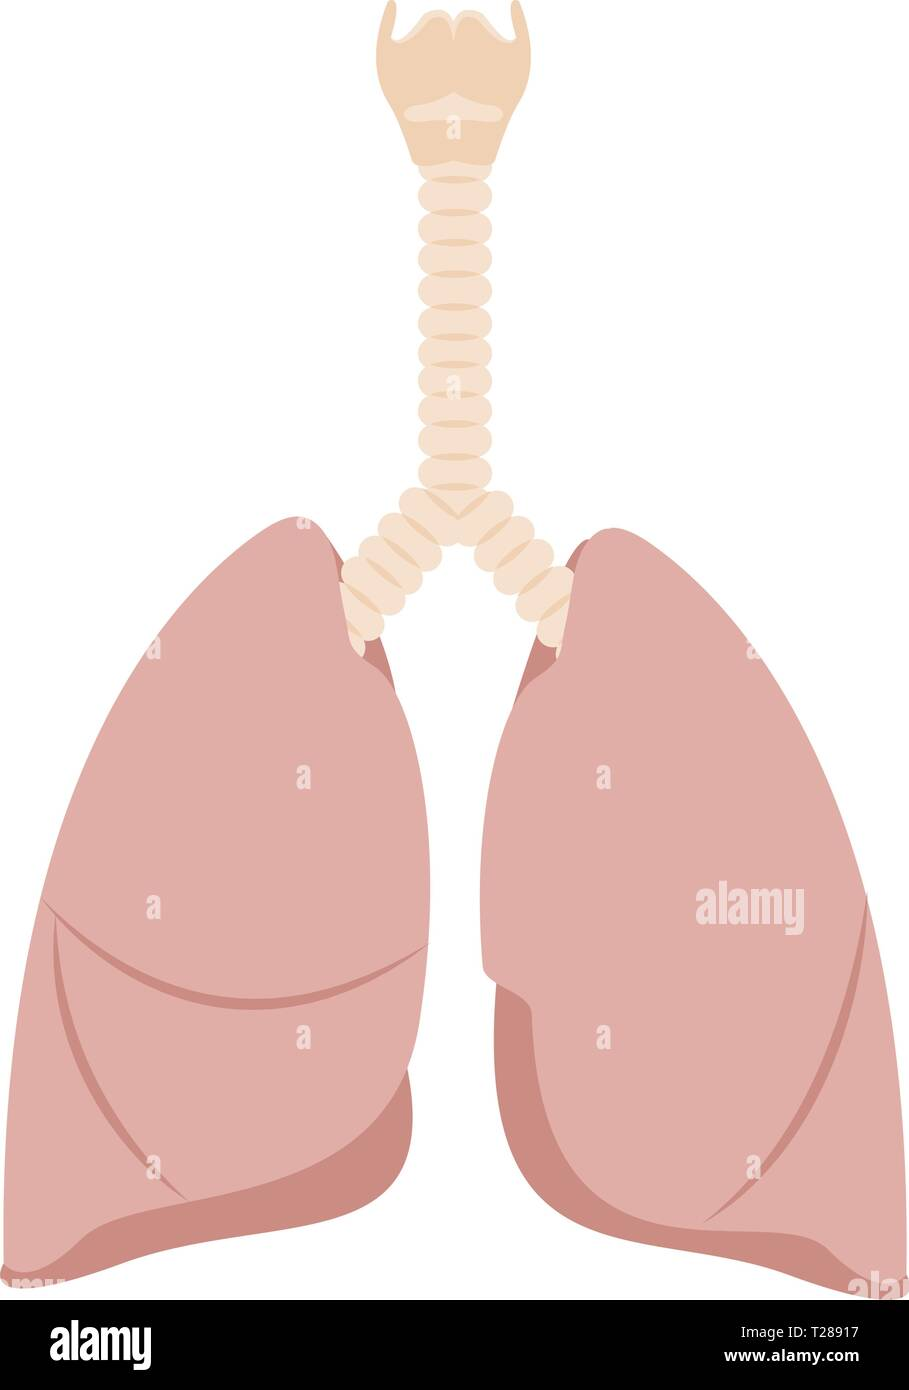 Abstract human lung - Stock Image